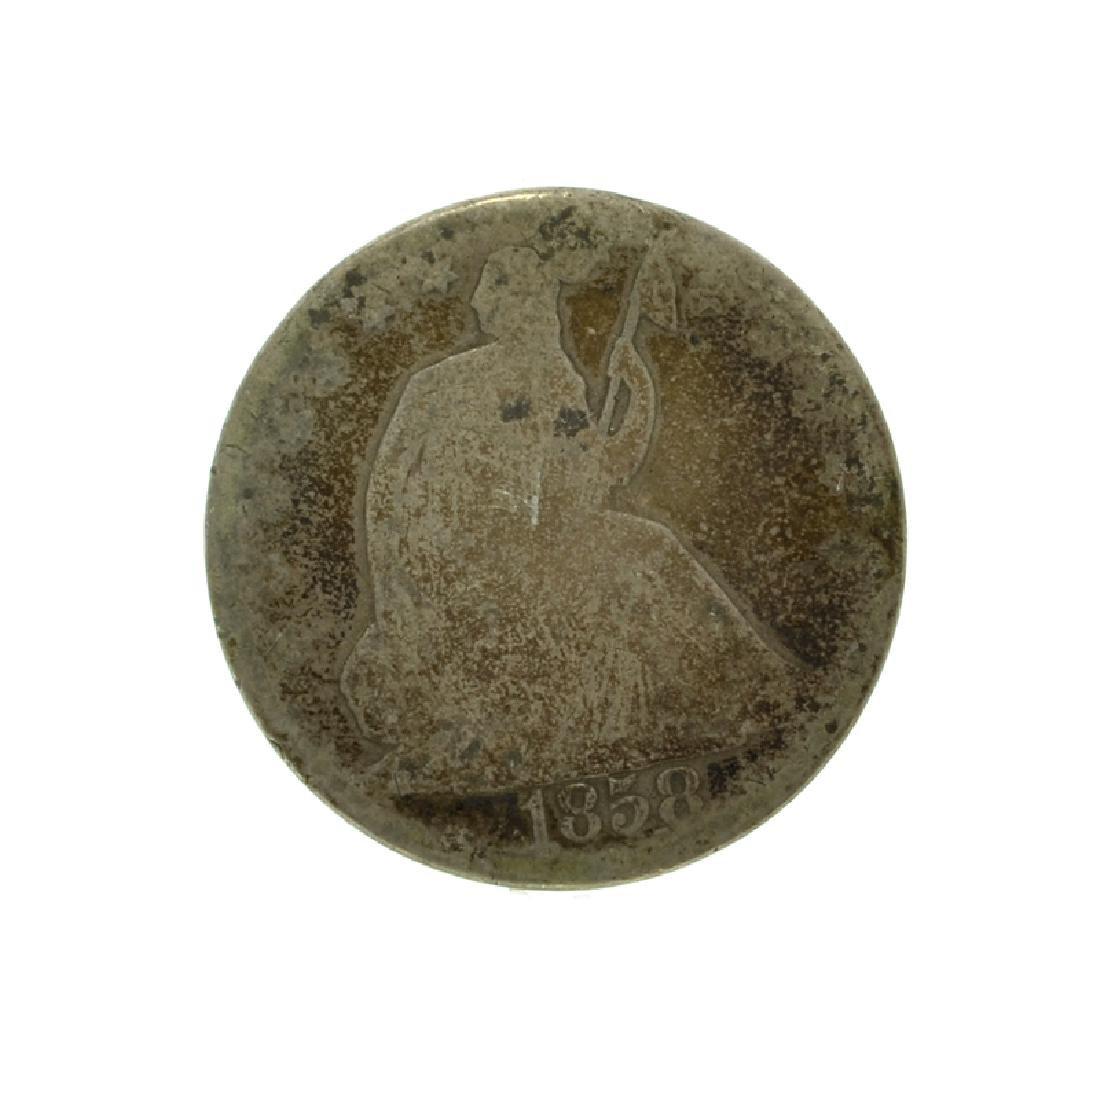 1858-O Liberty Seated Half Dollar Coin